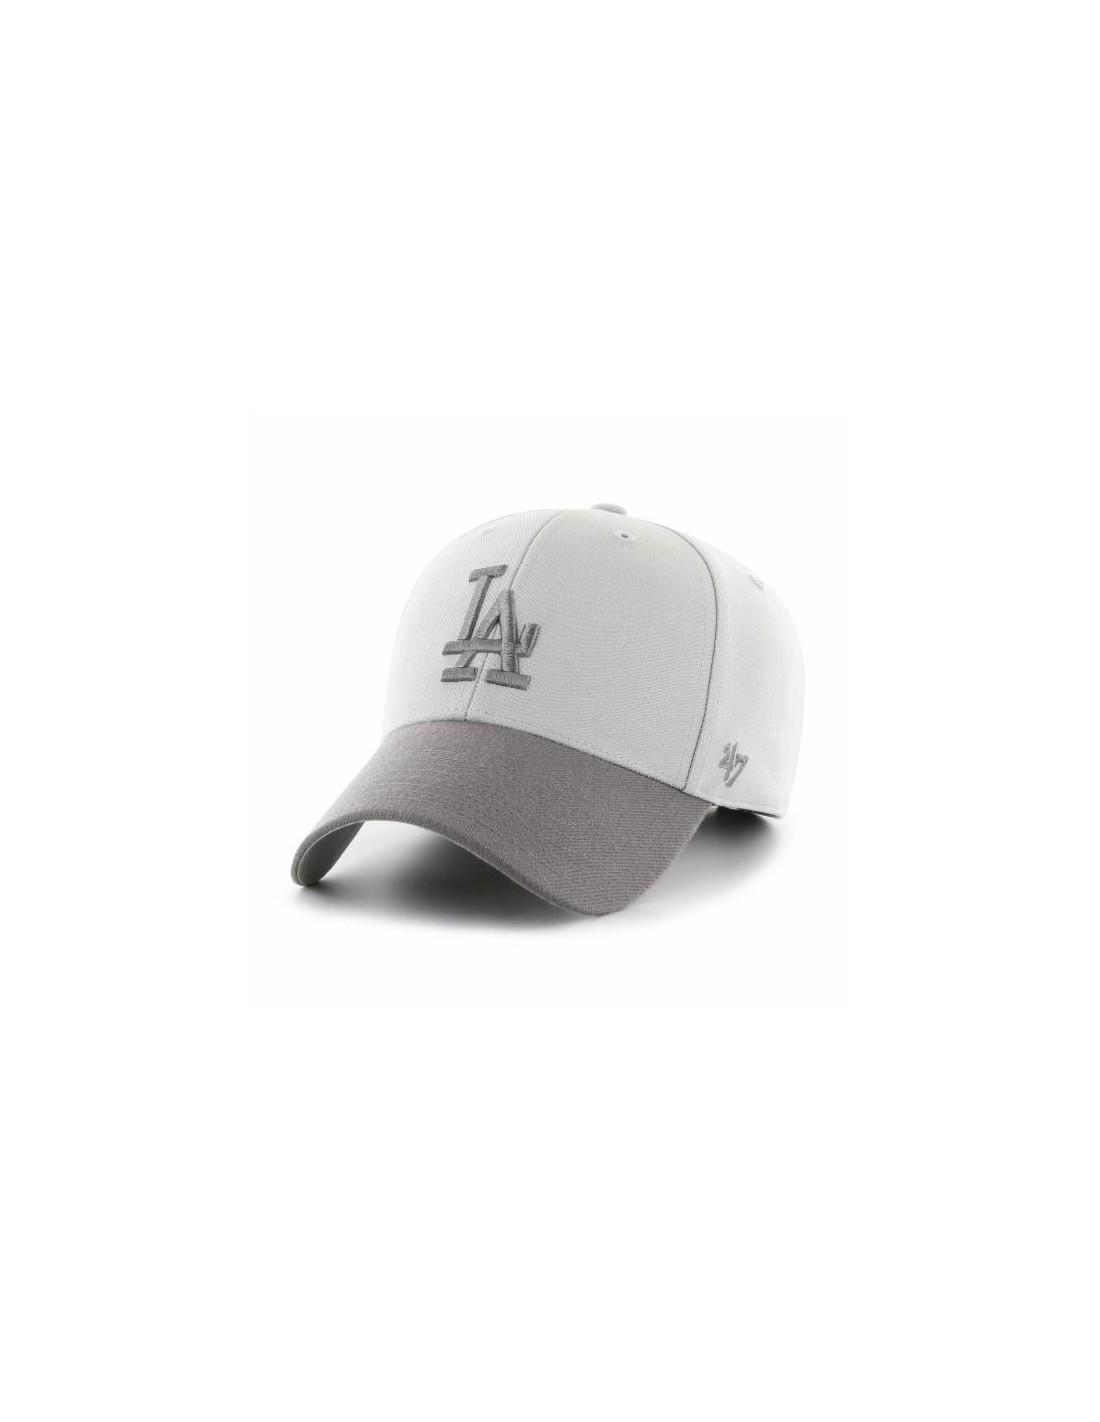 47 Gorra MVP Snapback Yankees by Brand Gorragorra de Beisbol